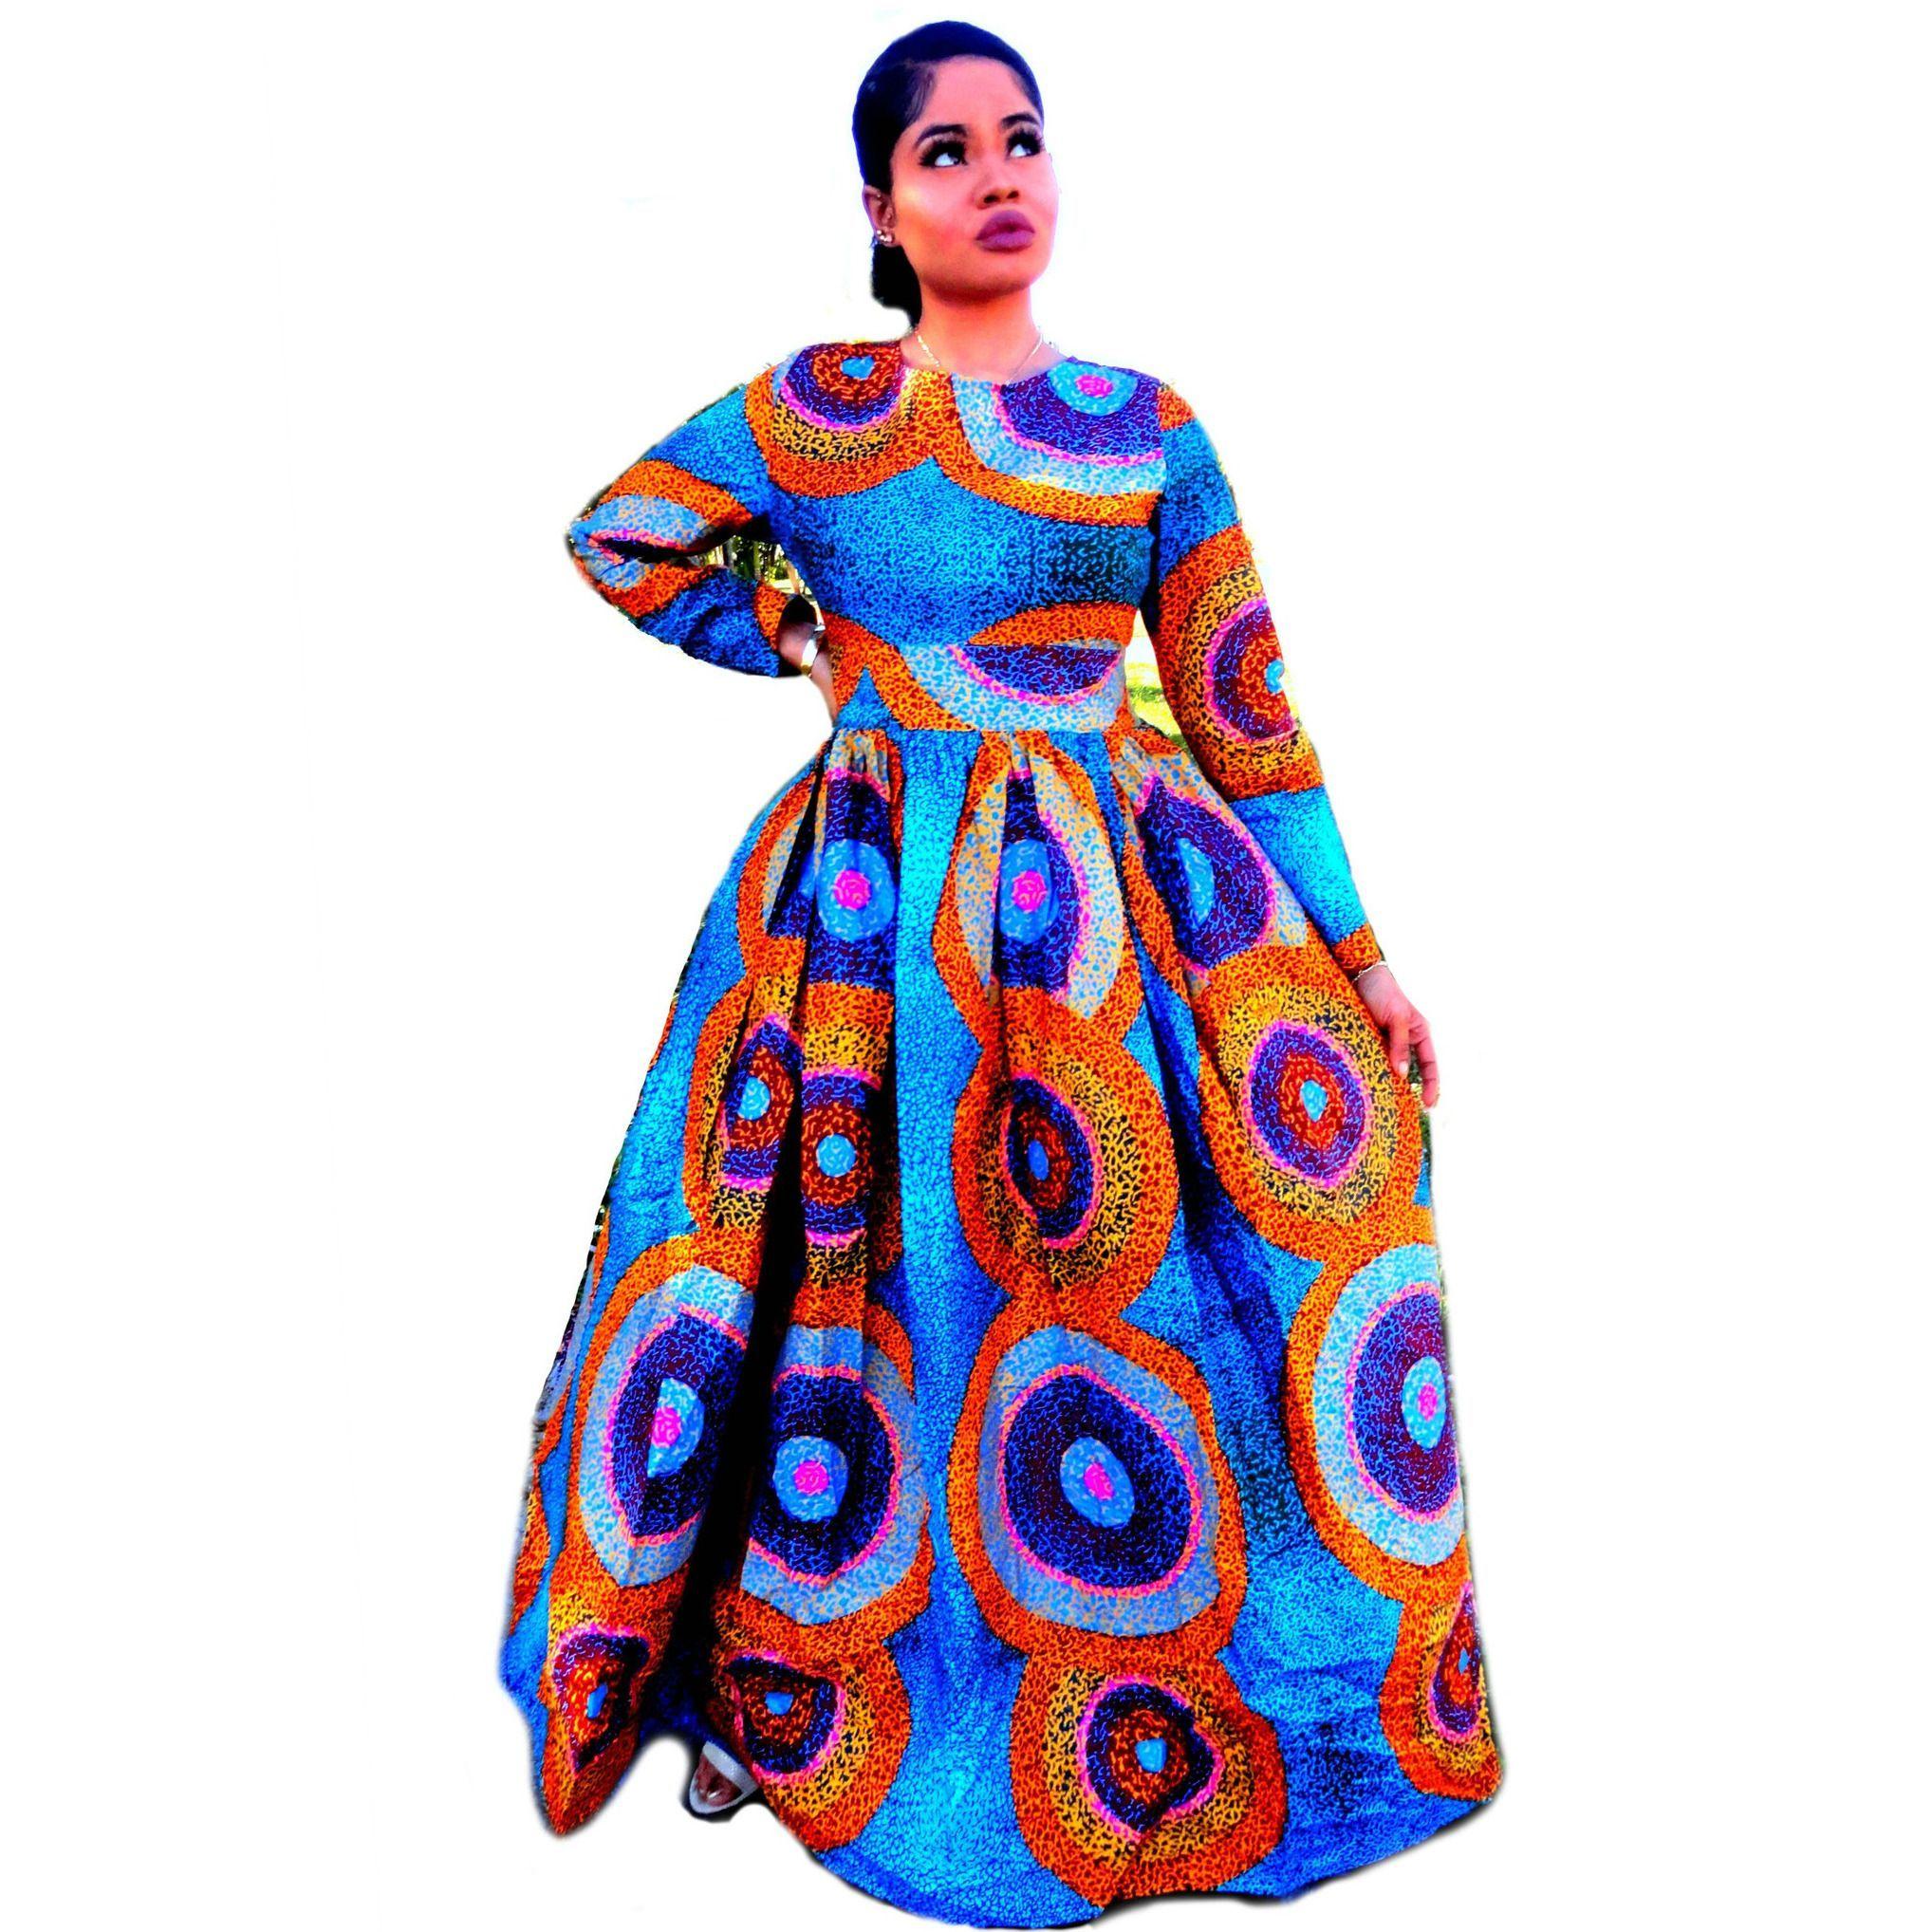 dbb82377767 JUJU African Print Long Sleeve Maxi Dress - Zabba Designs African Clothing  Store - 1